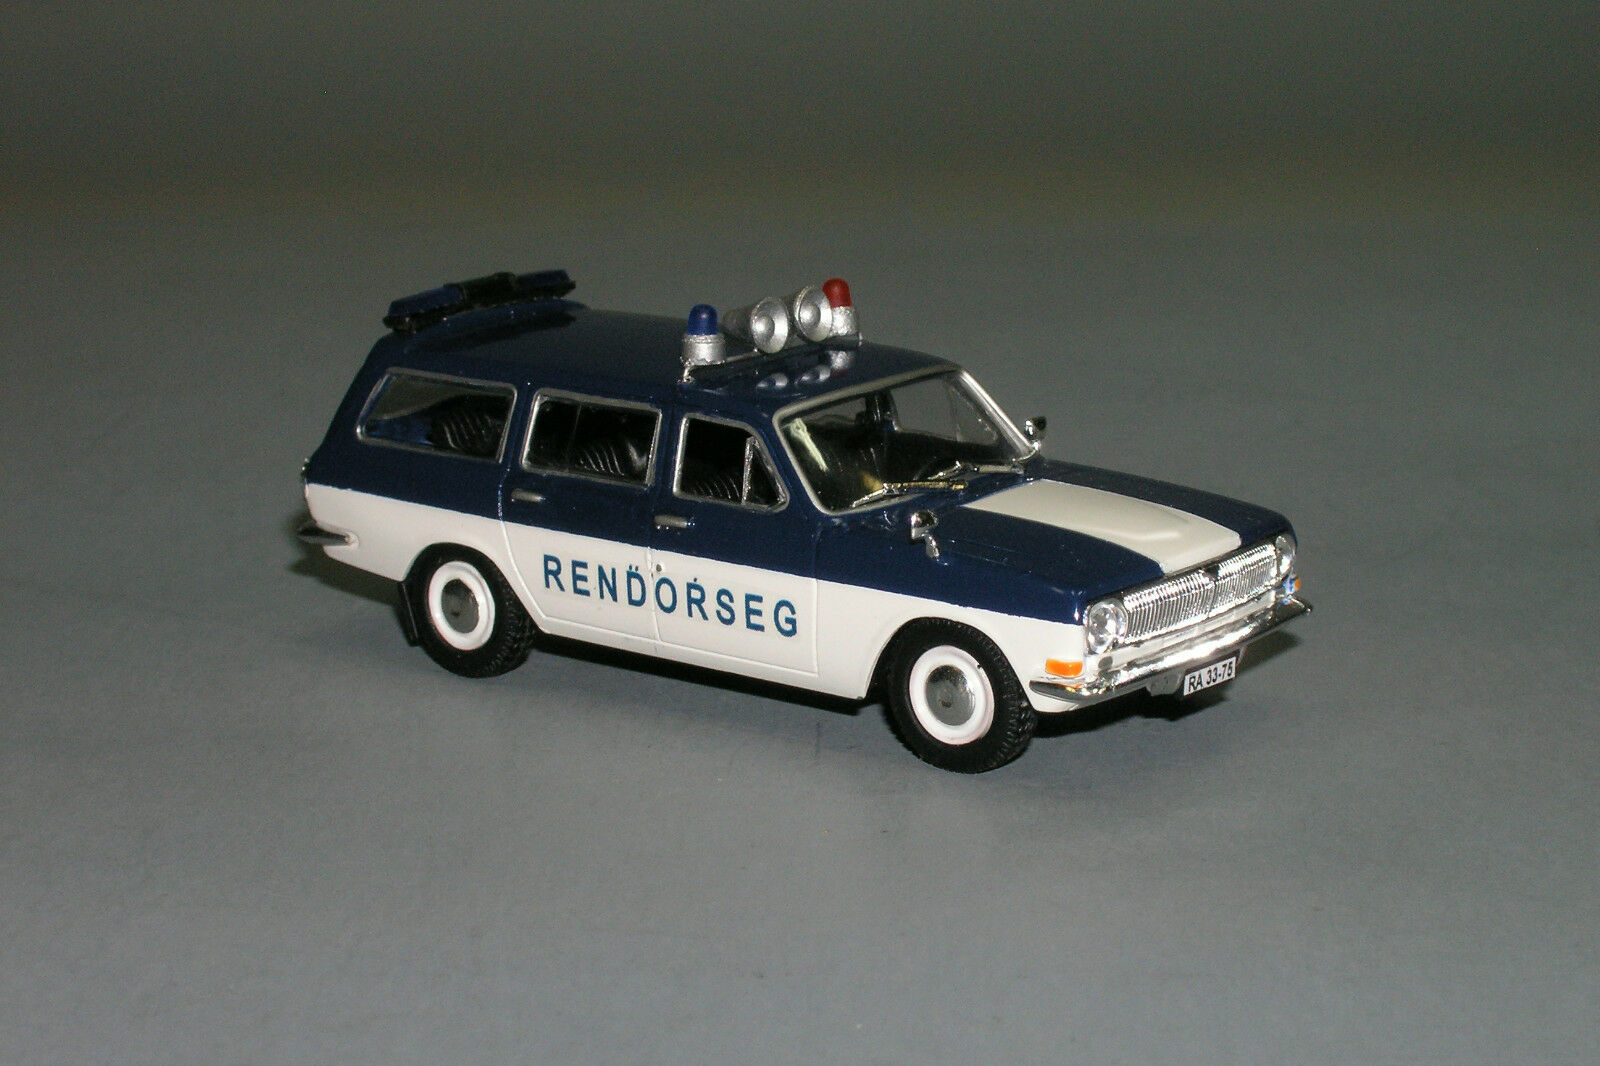 RARE     Gaz Volga 24-02 Rendorseg Rendőrség Hungary Police Custom Made 1 43